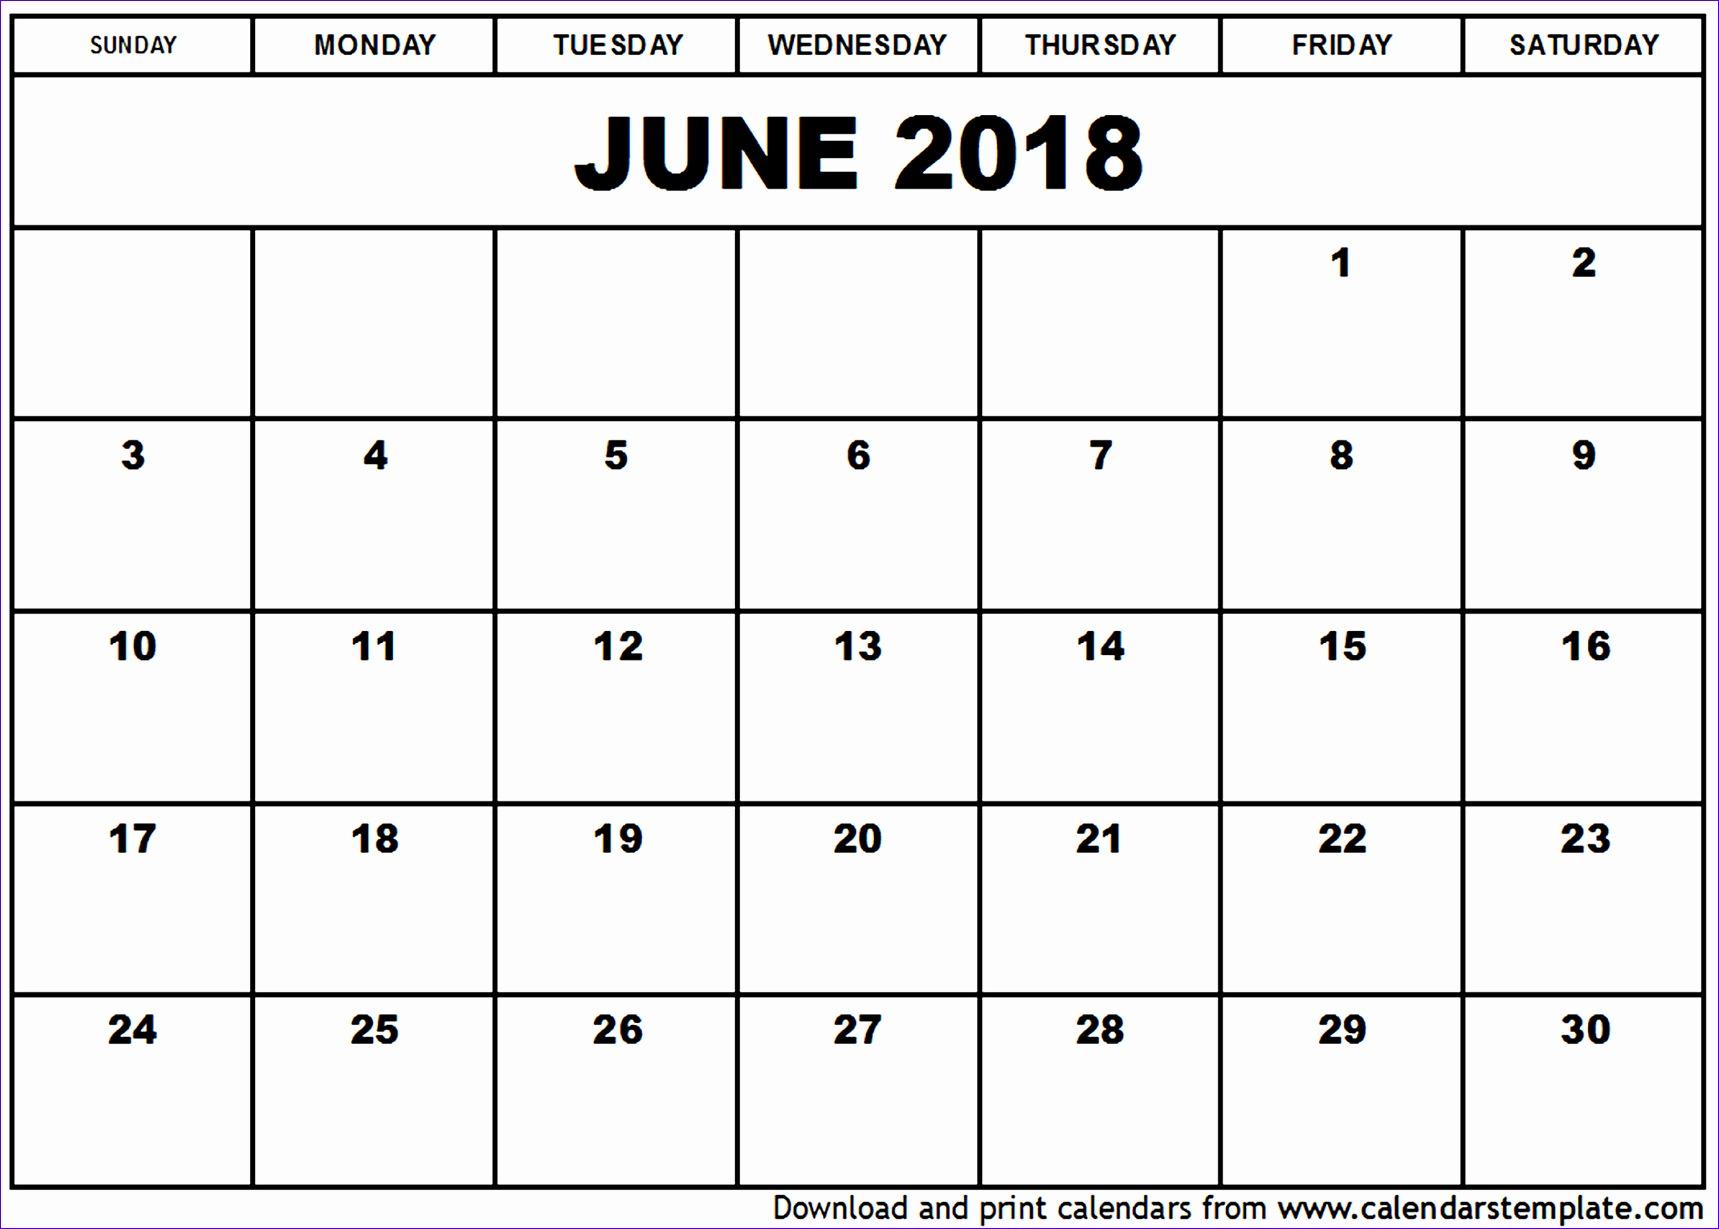 june 2018 calendar template 830 17191229